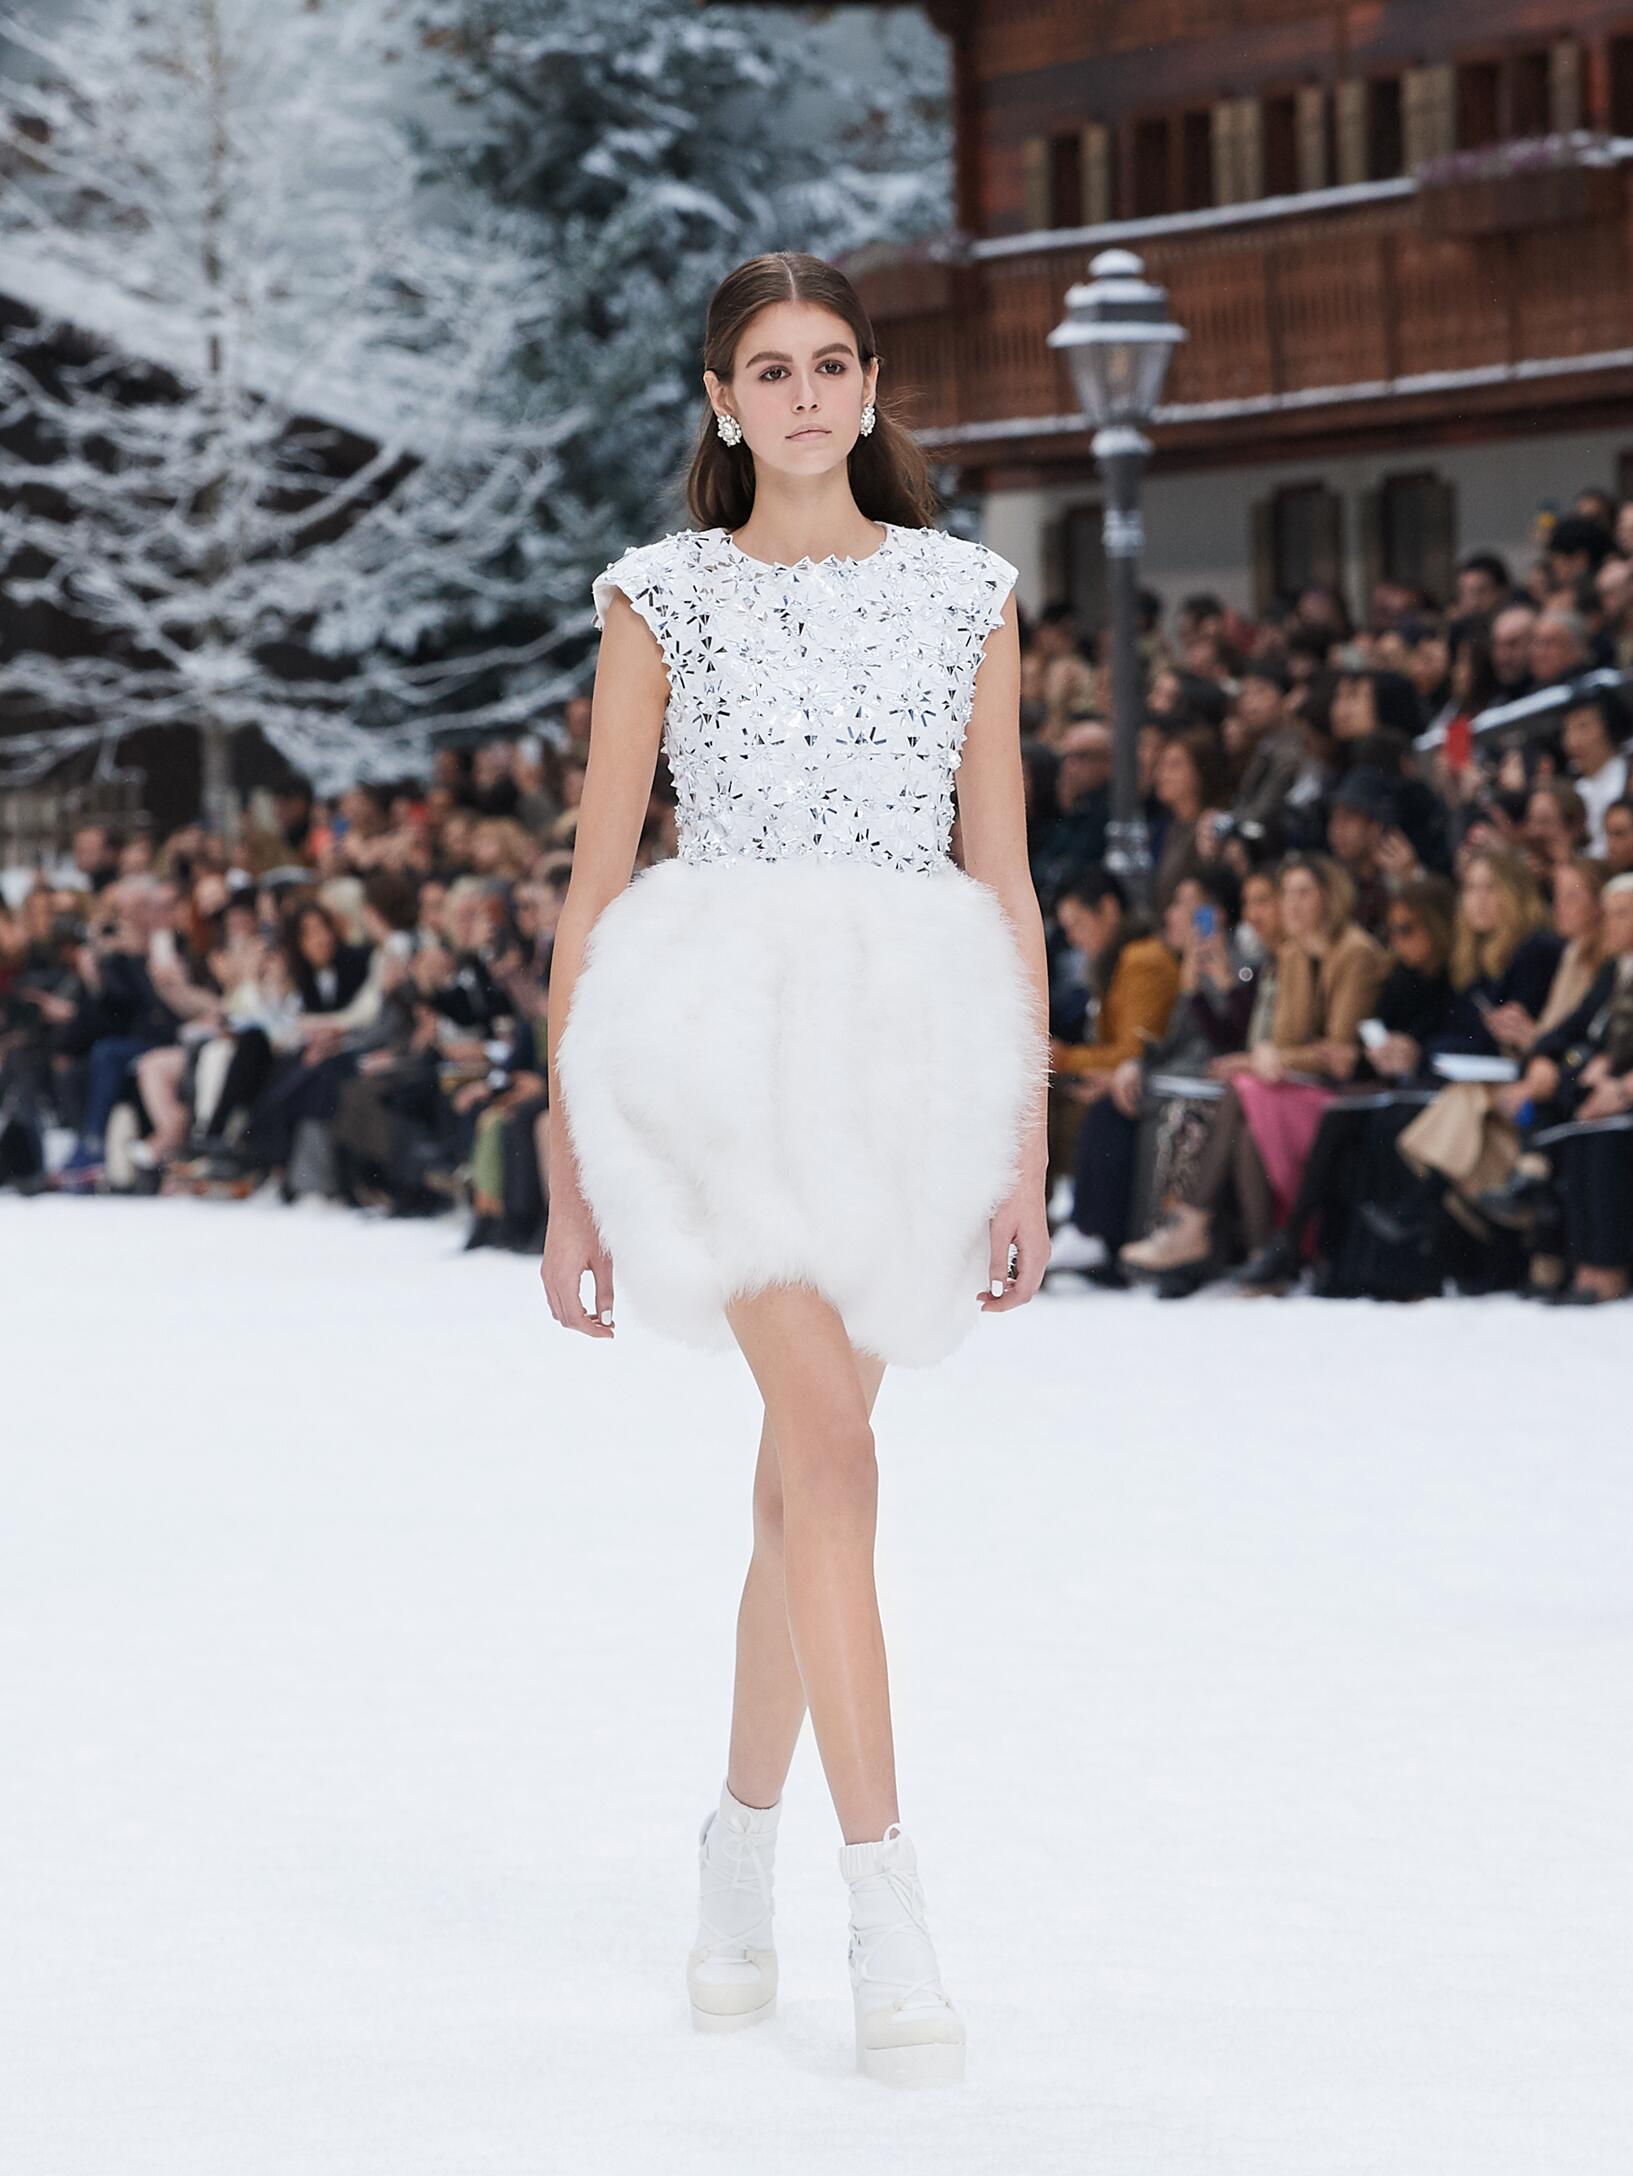 FW 2019 Chanel Show Paris Fashion Week Womenswear